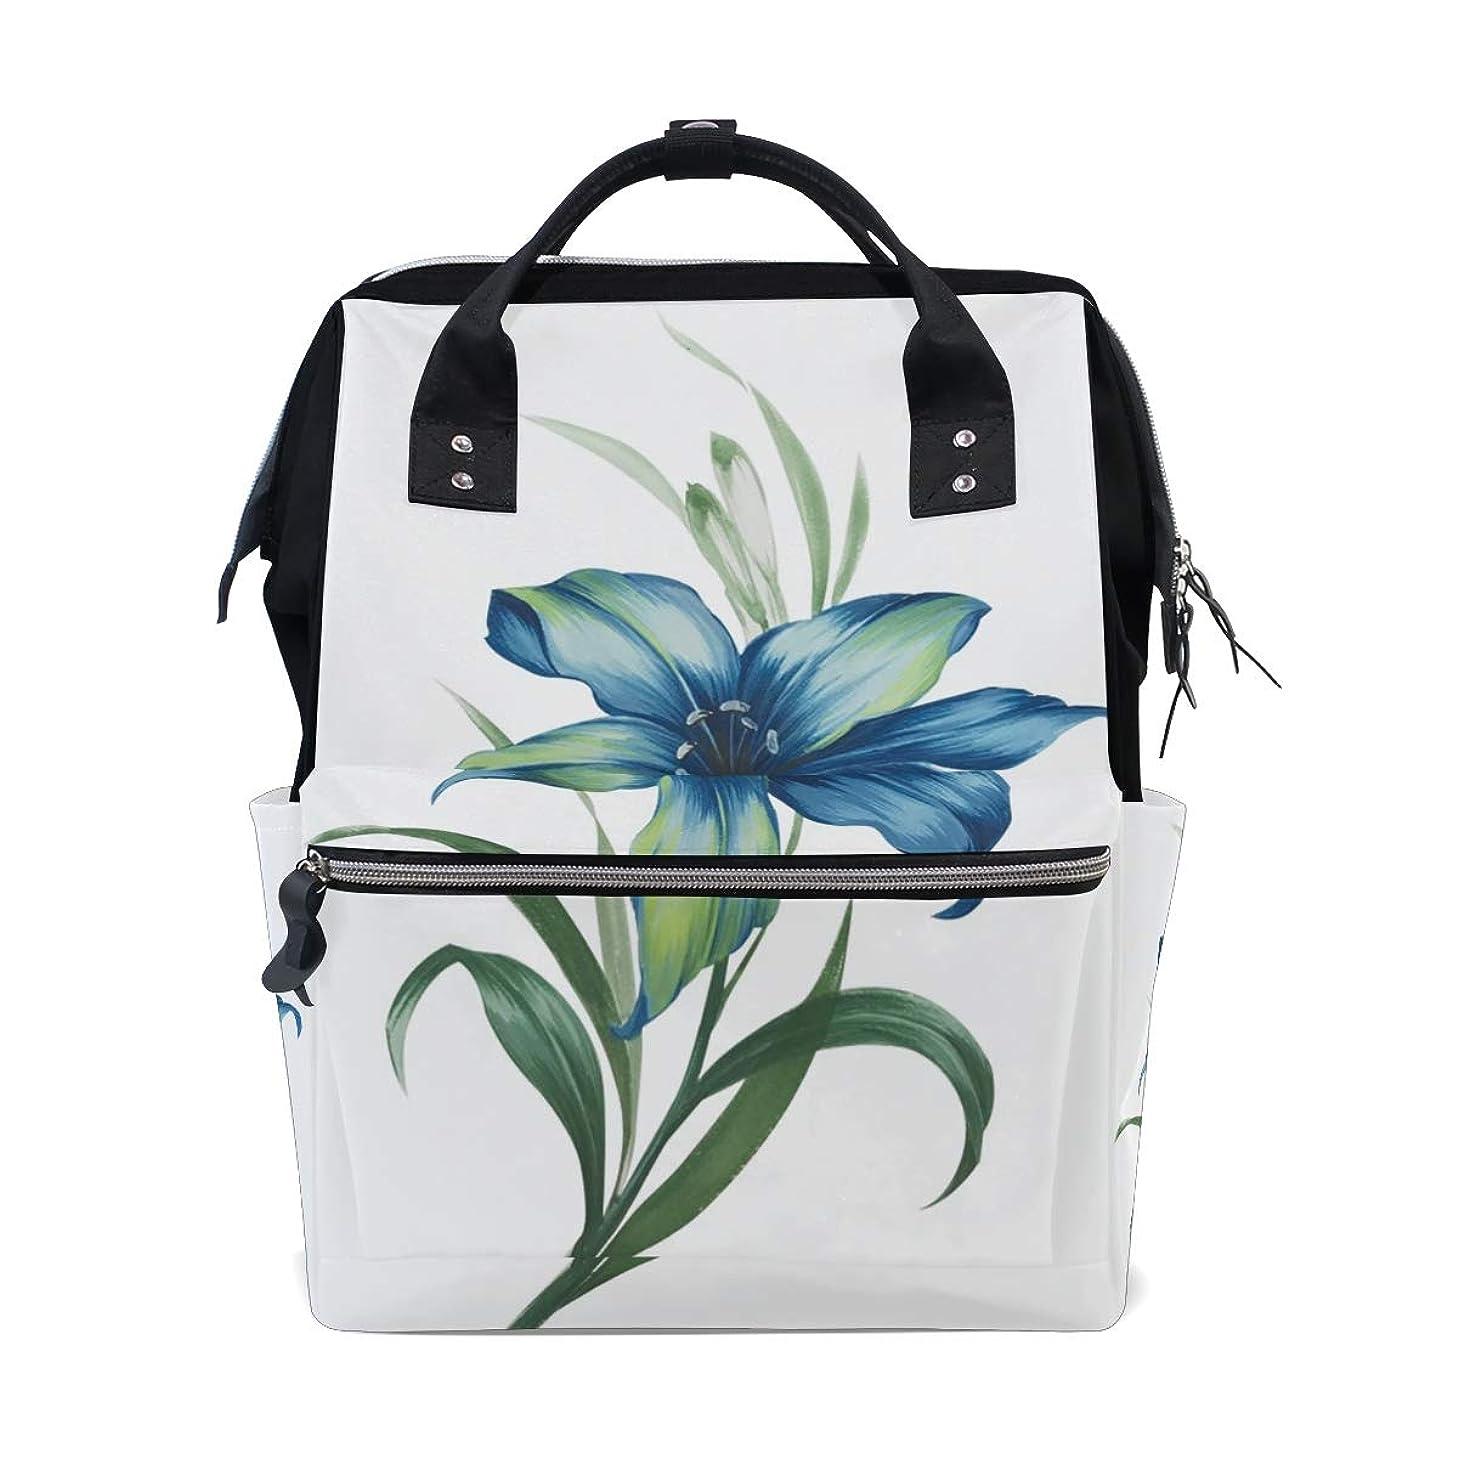 Backpack Blue Watercolor Flower Vintage School Rucksack Diaper Bags Travel Shoulder Large Capacity Bookbag for Women Men